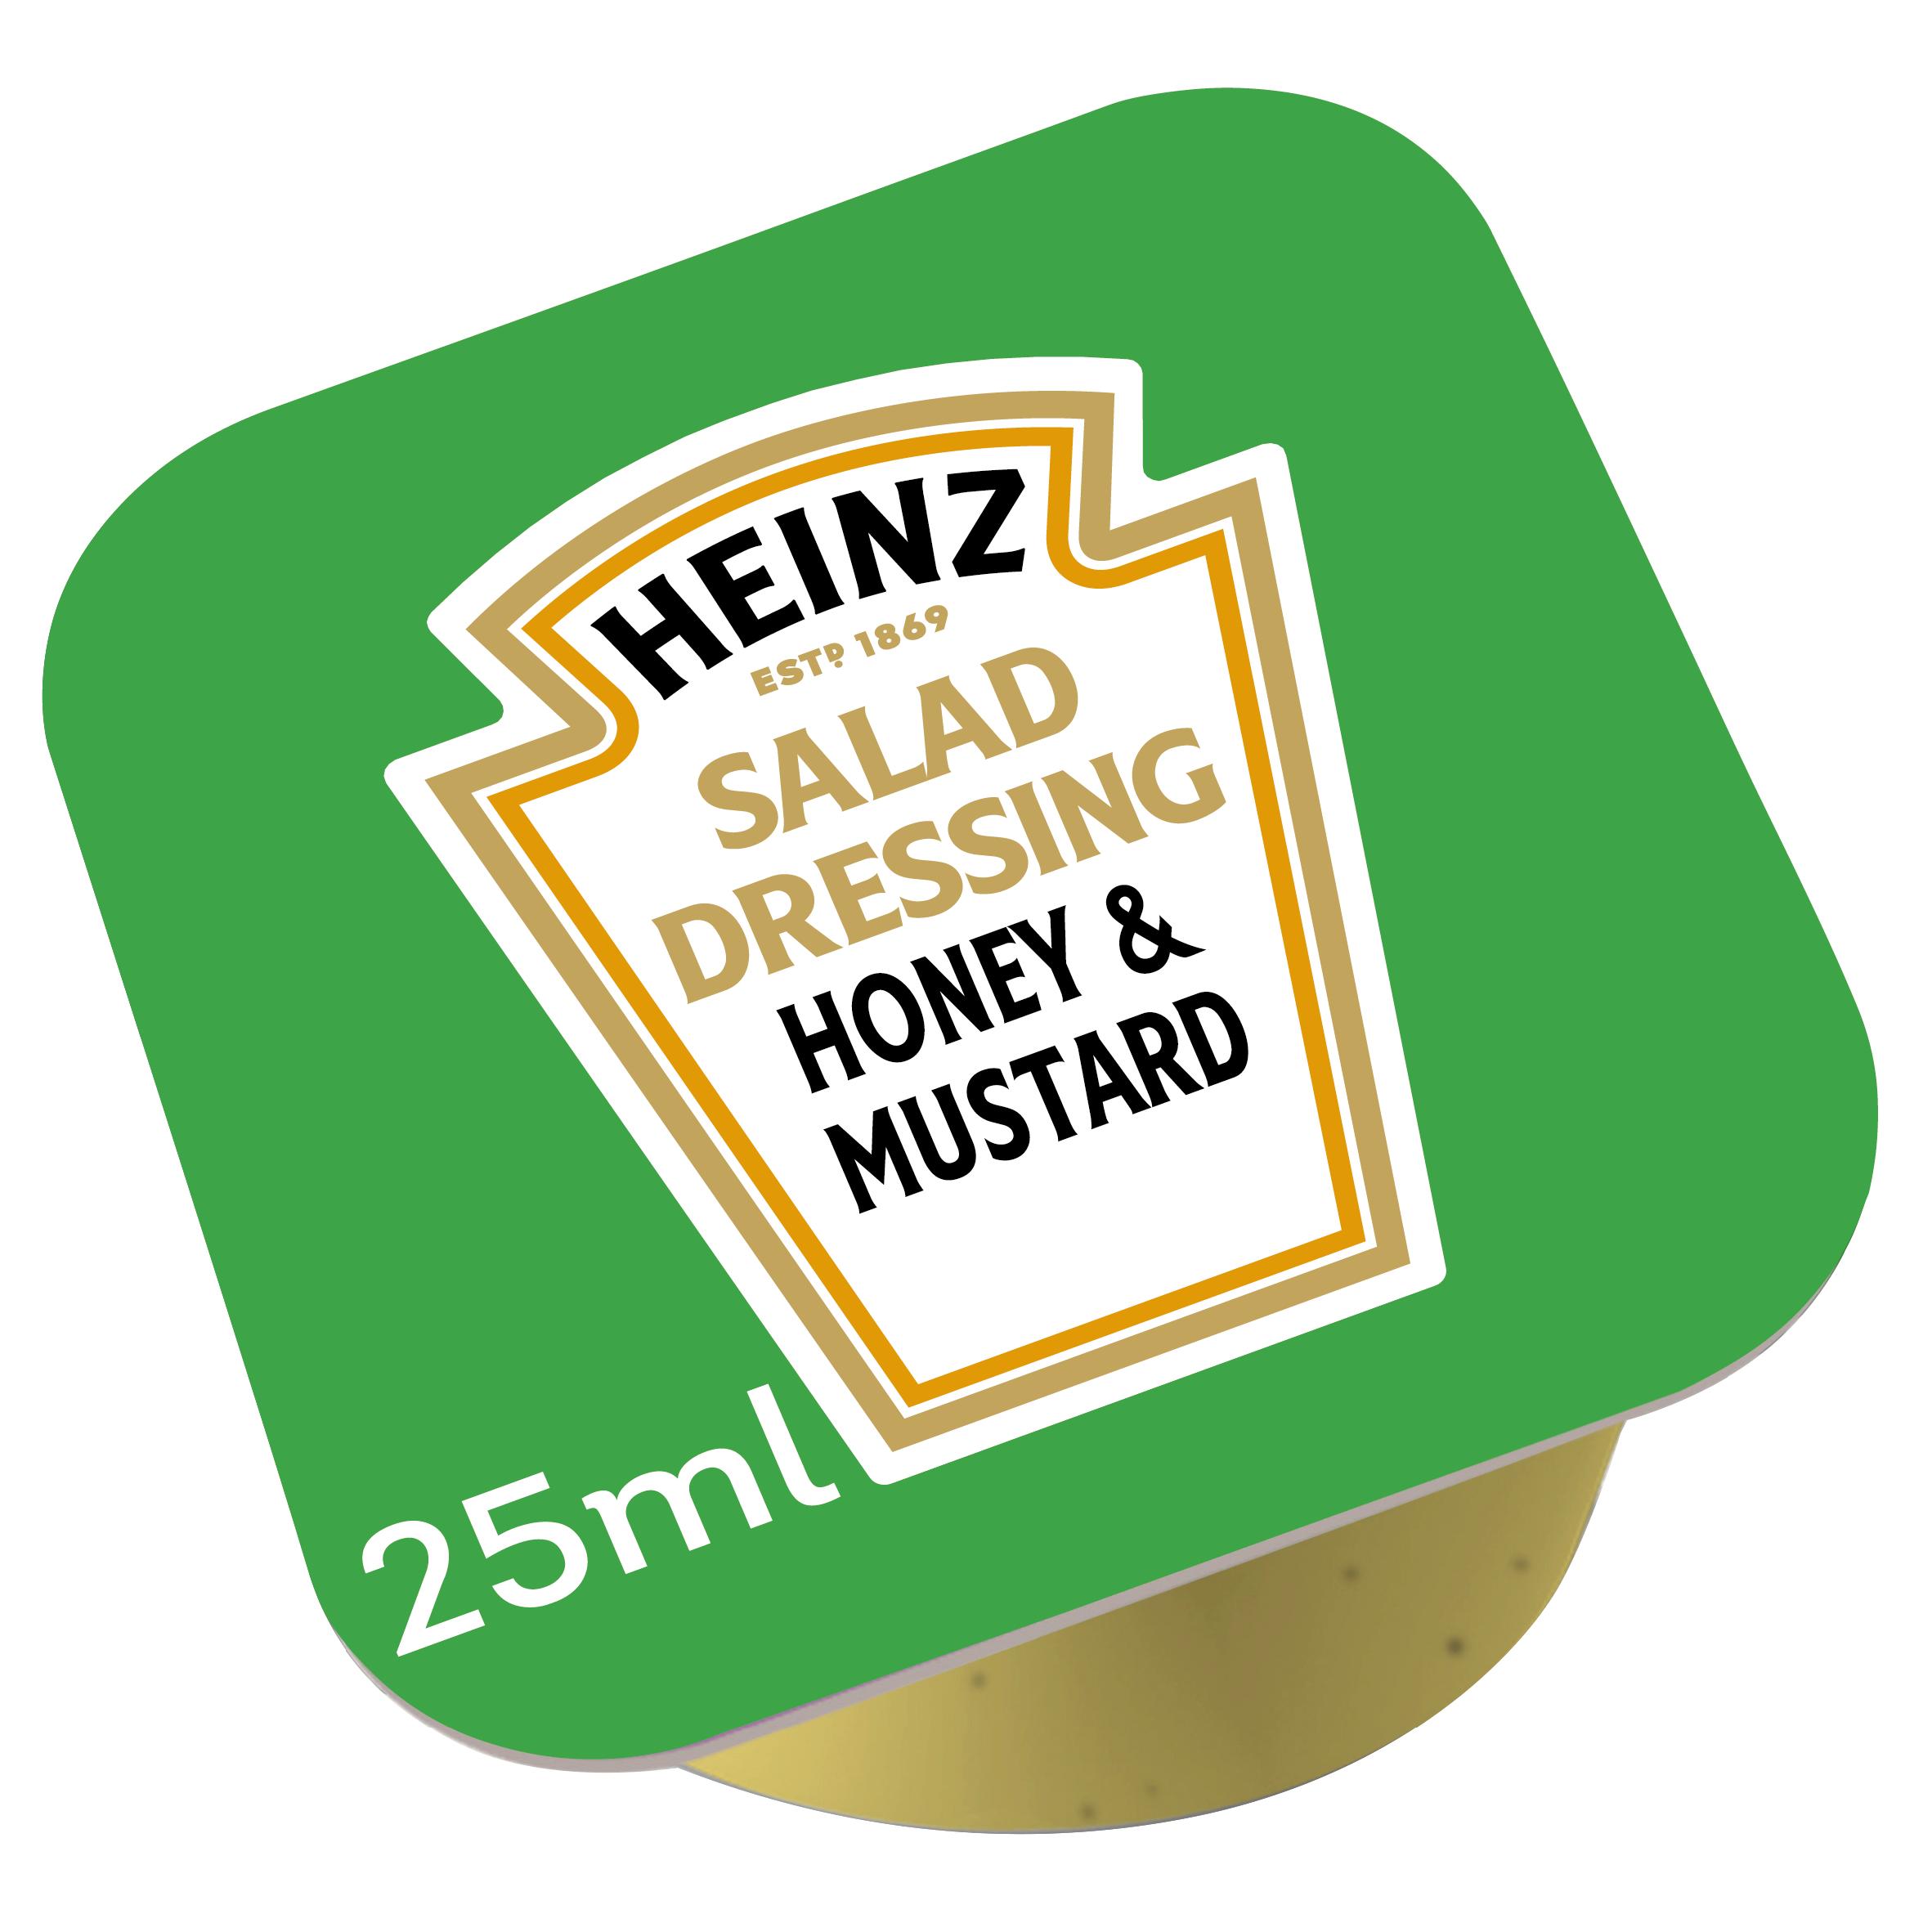 Heinz Honing Mosterd dressing 25ml dippot image